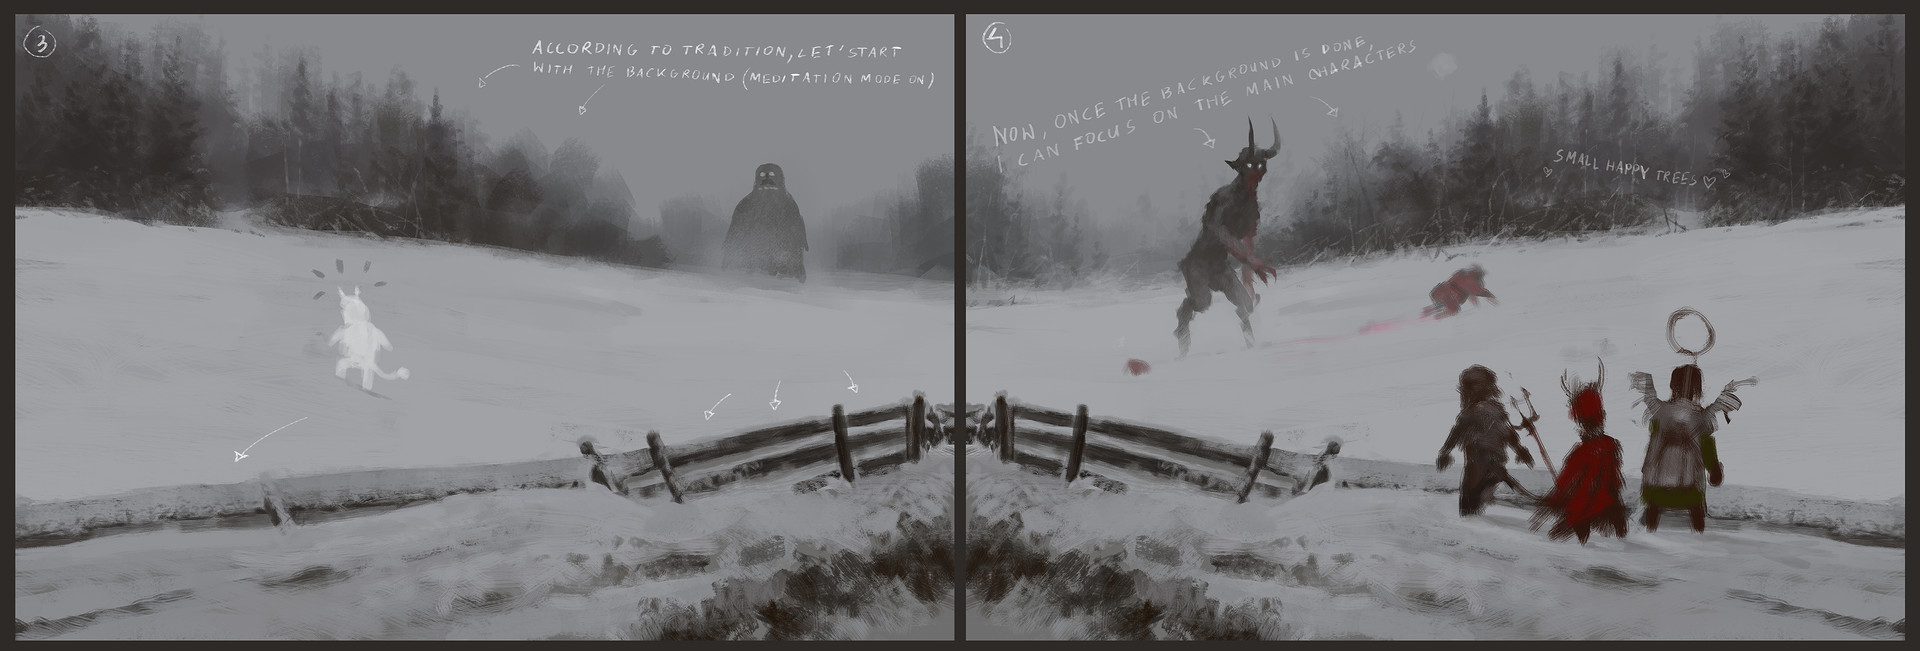 Jakub rozalski santa vs krampus process2